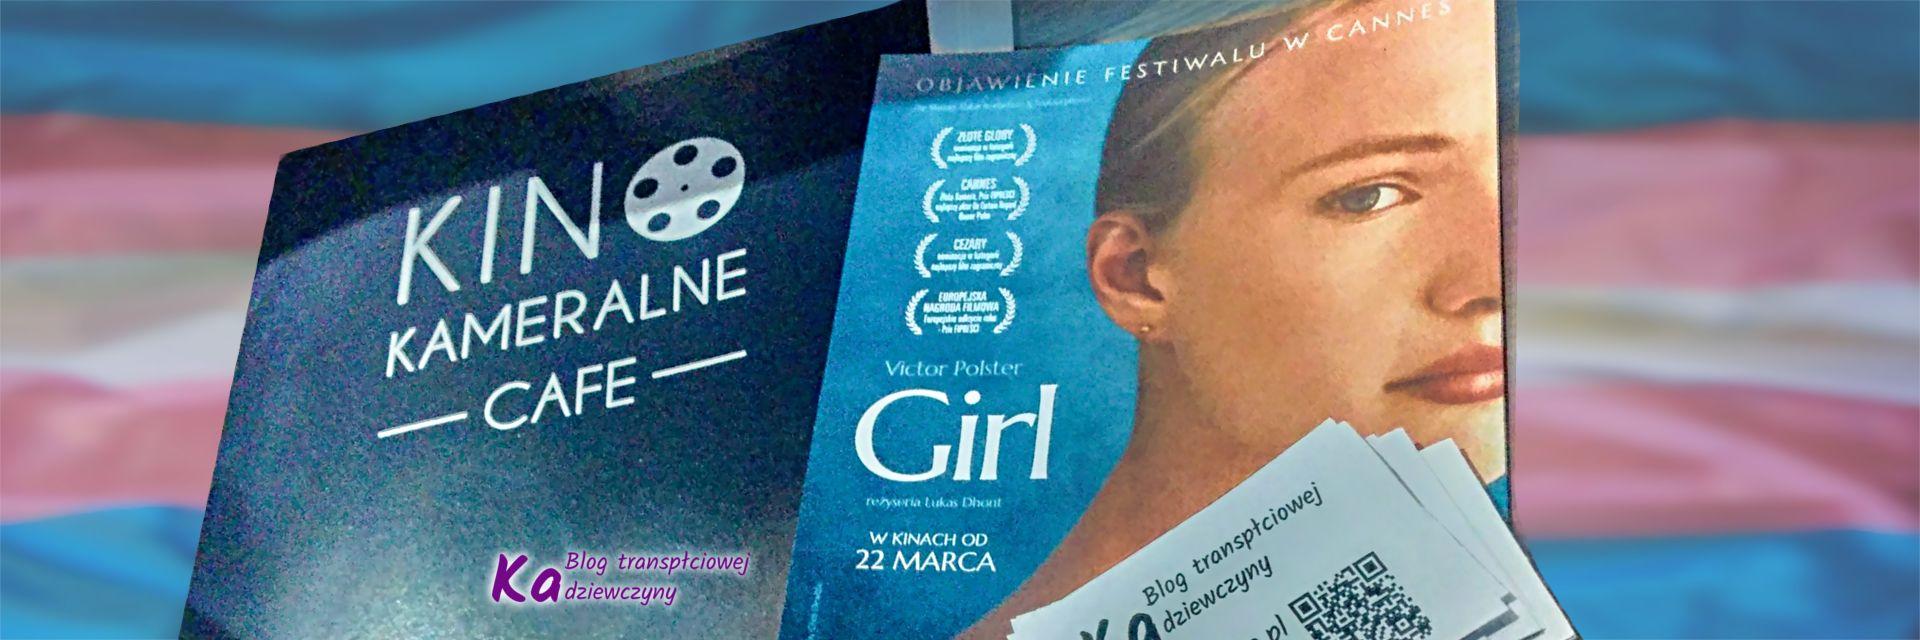 Film Girl z dyskusją, Gdańsk, Kino Kameralne Cafe, Tolerado, Ka